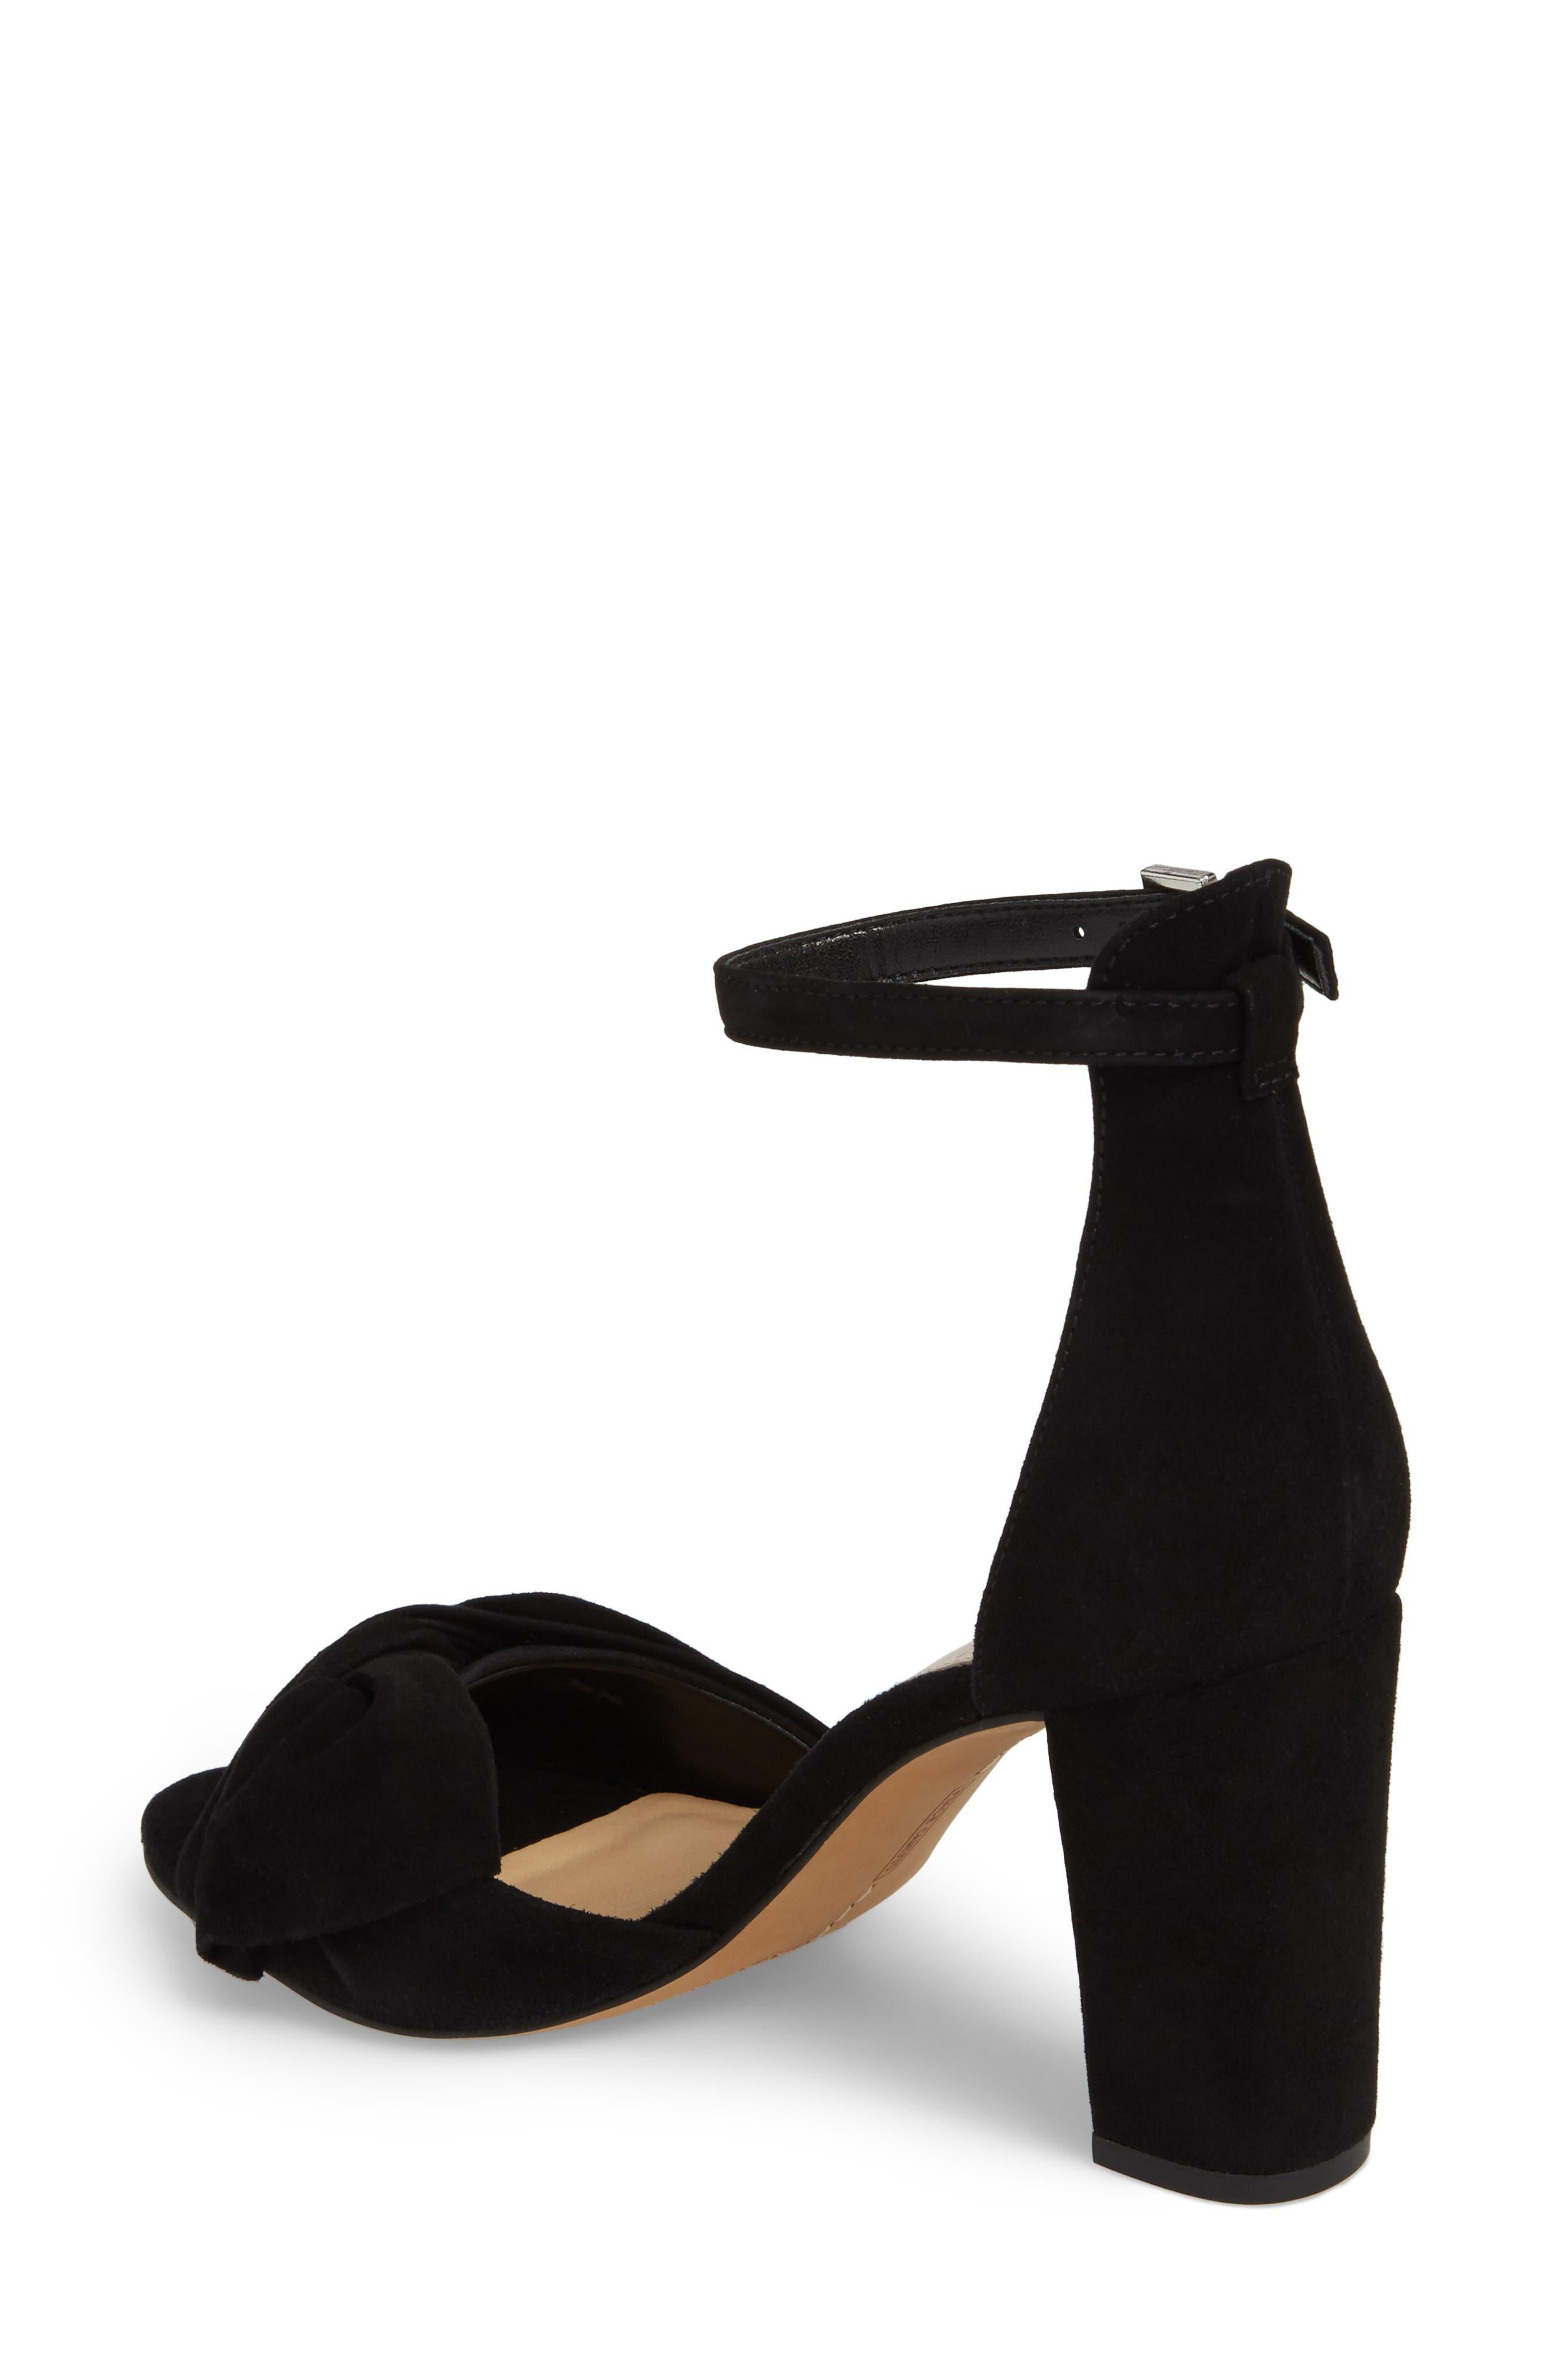 Carrelen Block Heel Sandal,                             Alternate thumbnail 2, color,                             001